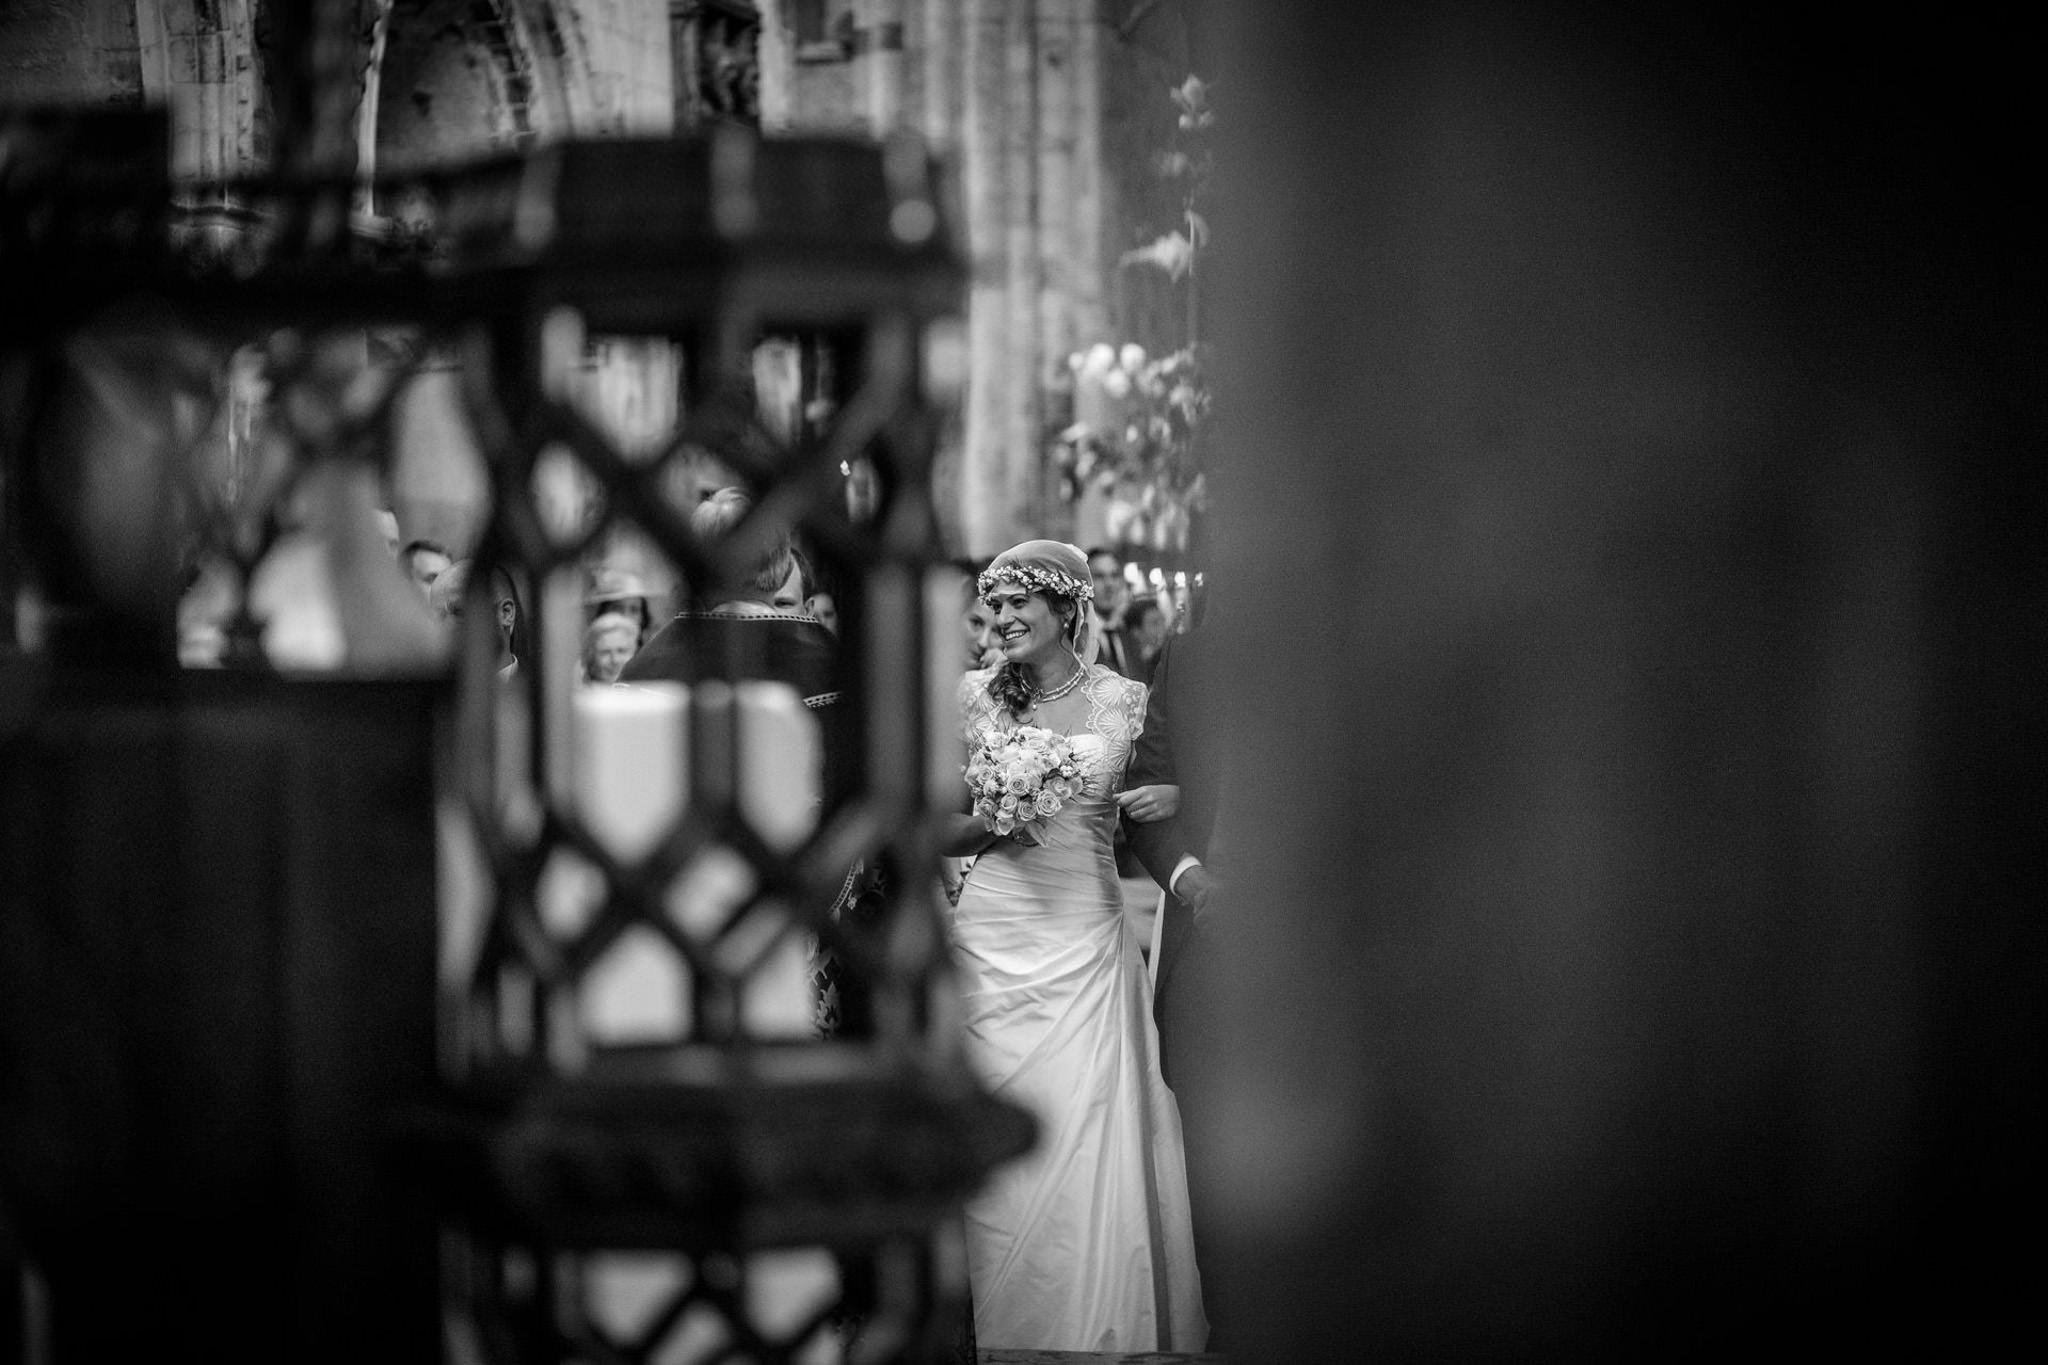 St. Pancras Renaissance hotel wedding bride looks at the groom